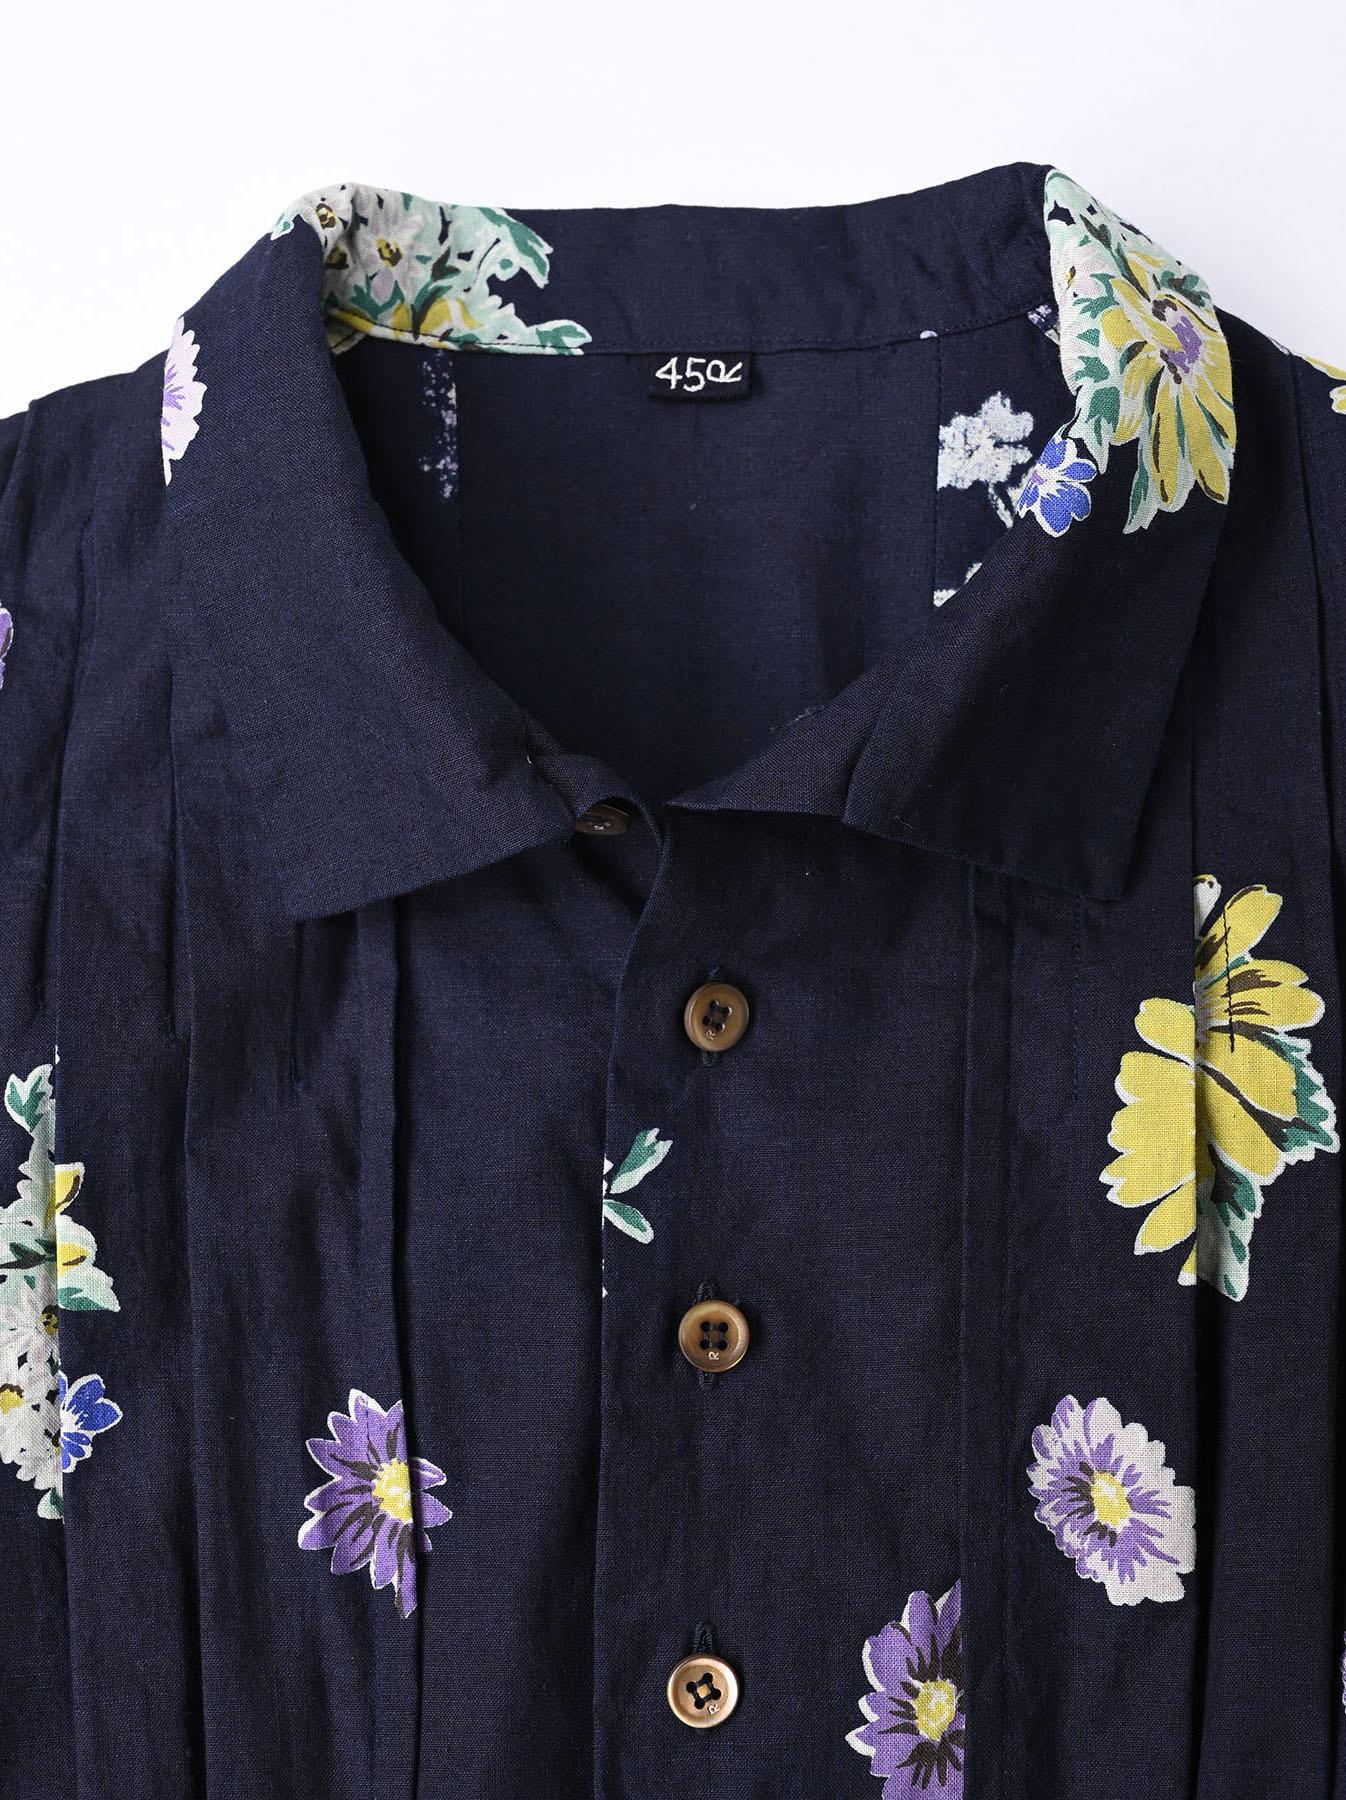 Indigo Margaret Print Dress-6